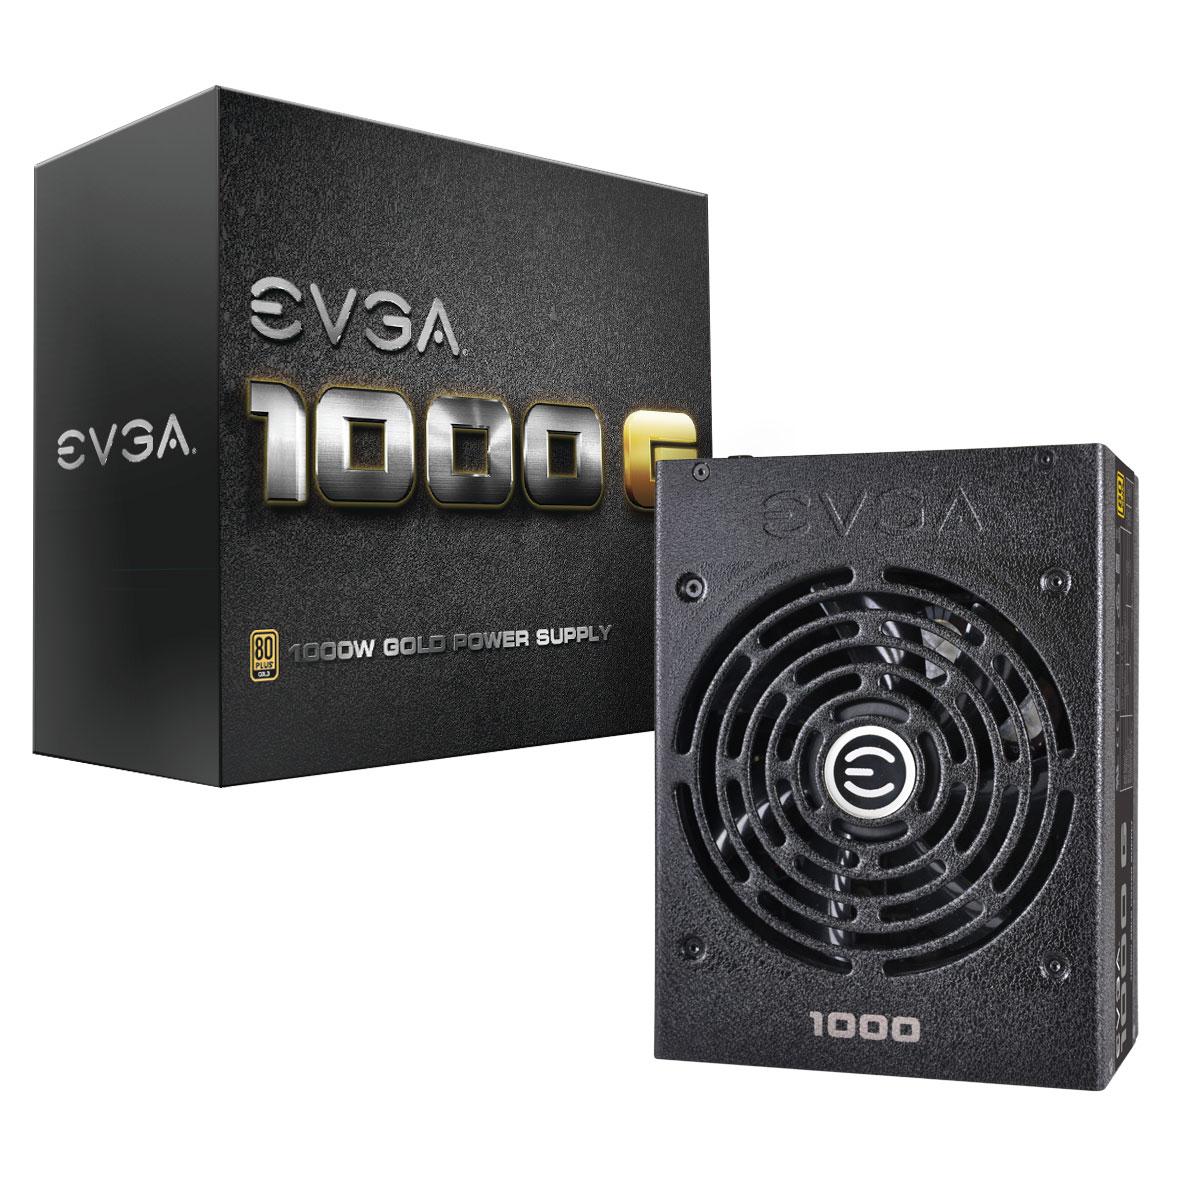 Fonte ATX 1000W Super NOVA 80 Plus Gold 120-G1-1000-VR Modular - EVGA